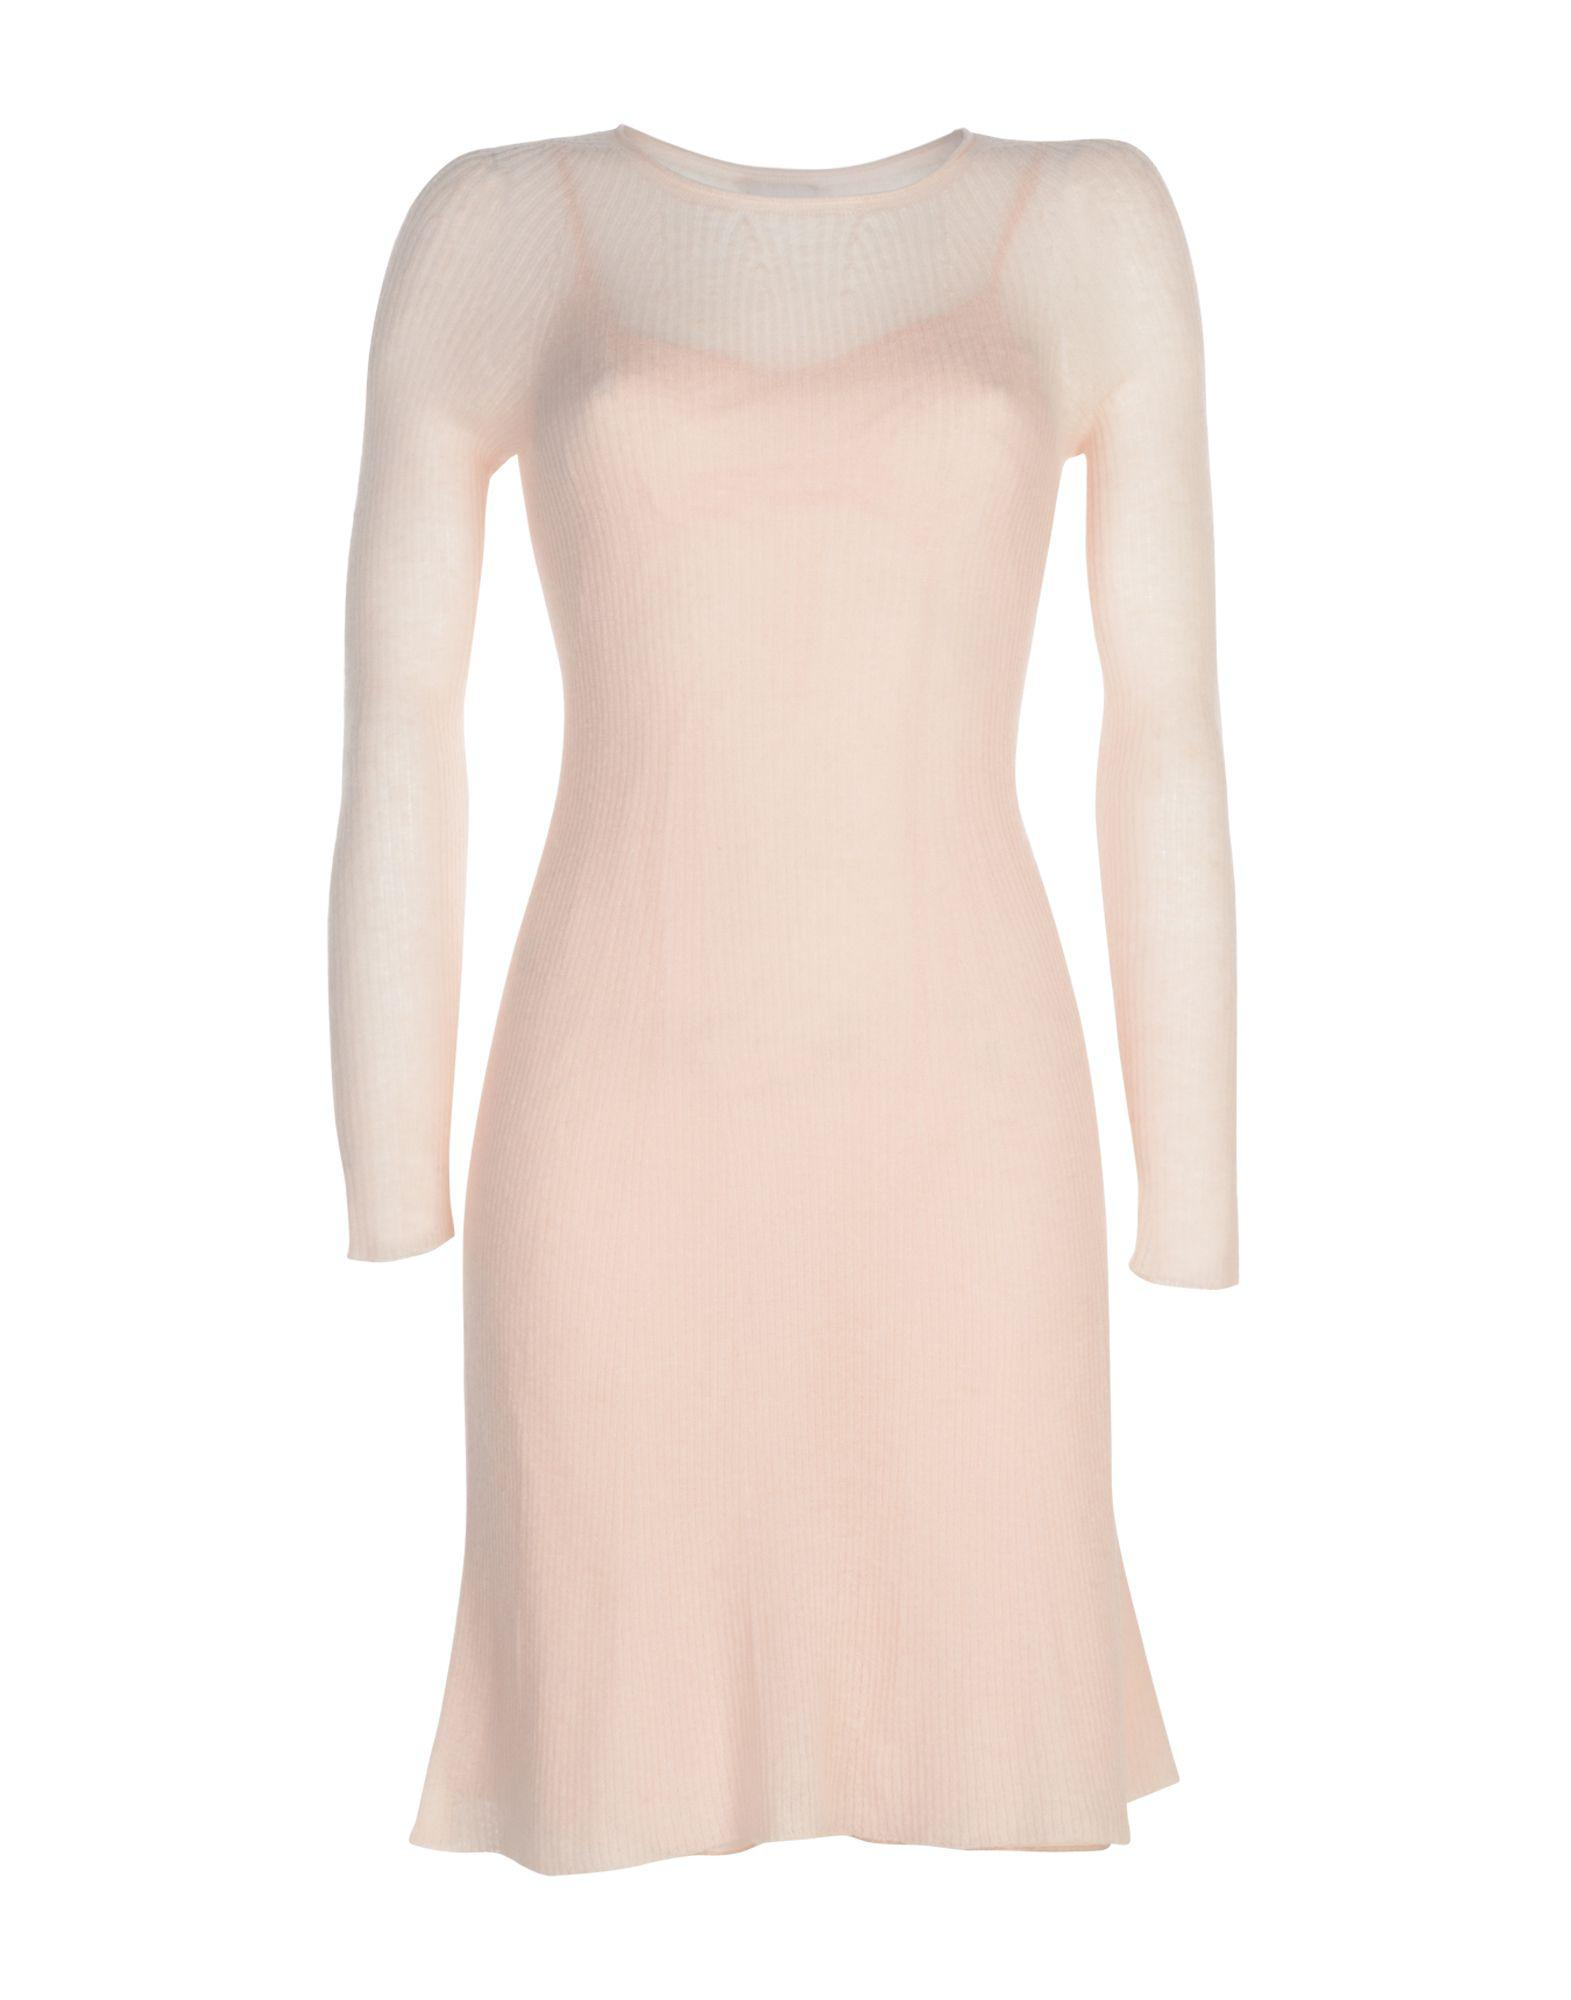 089b63e7c0 Lyst - Philosophy di Alberta Ferretti Short Dress in Pink